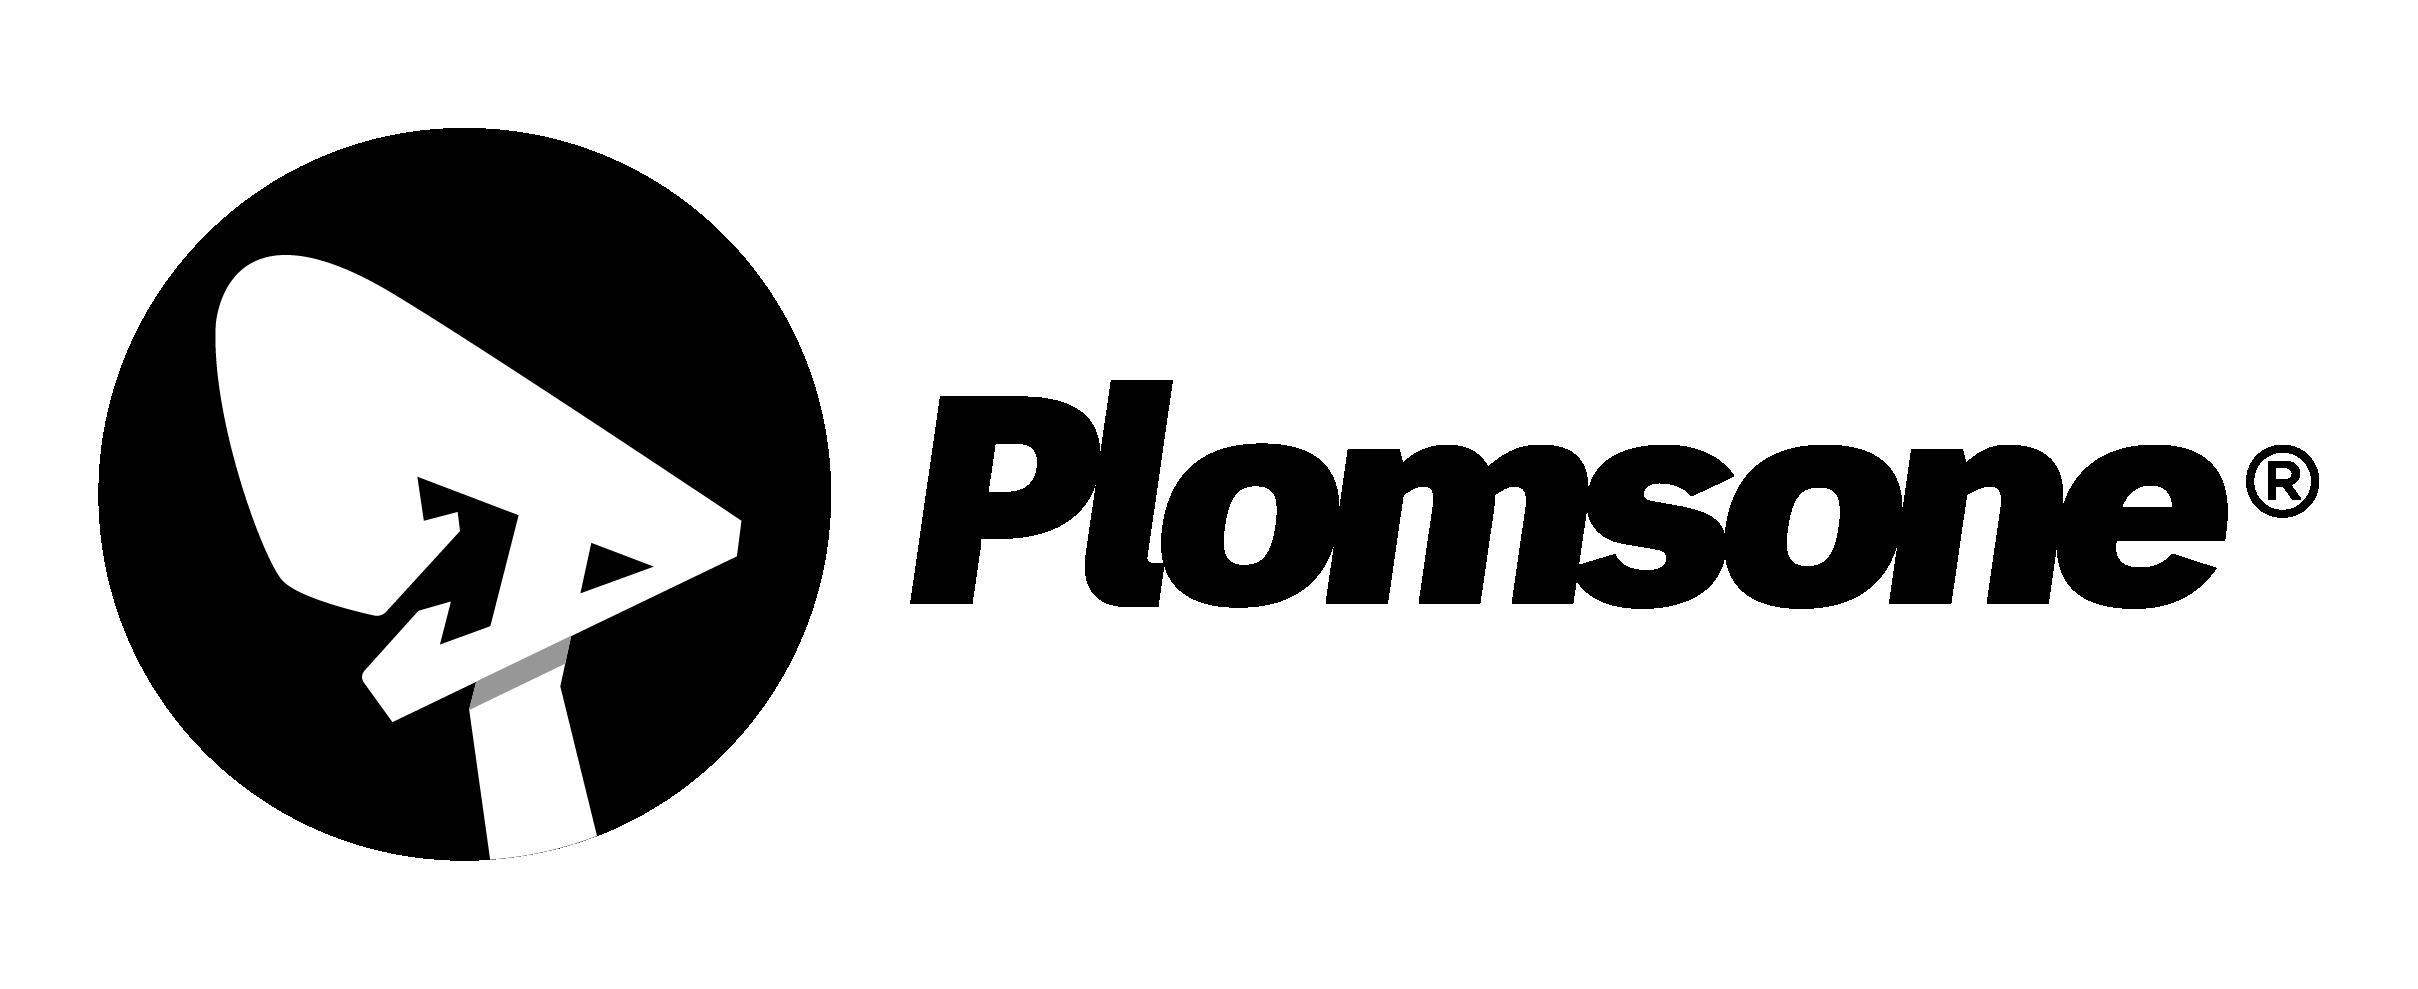 official_logo_r